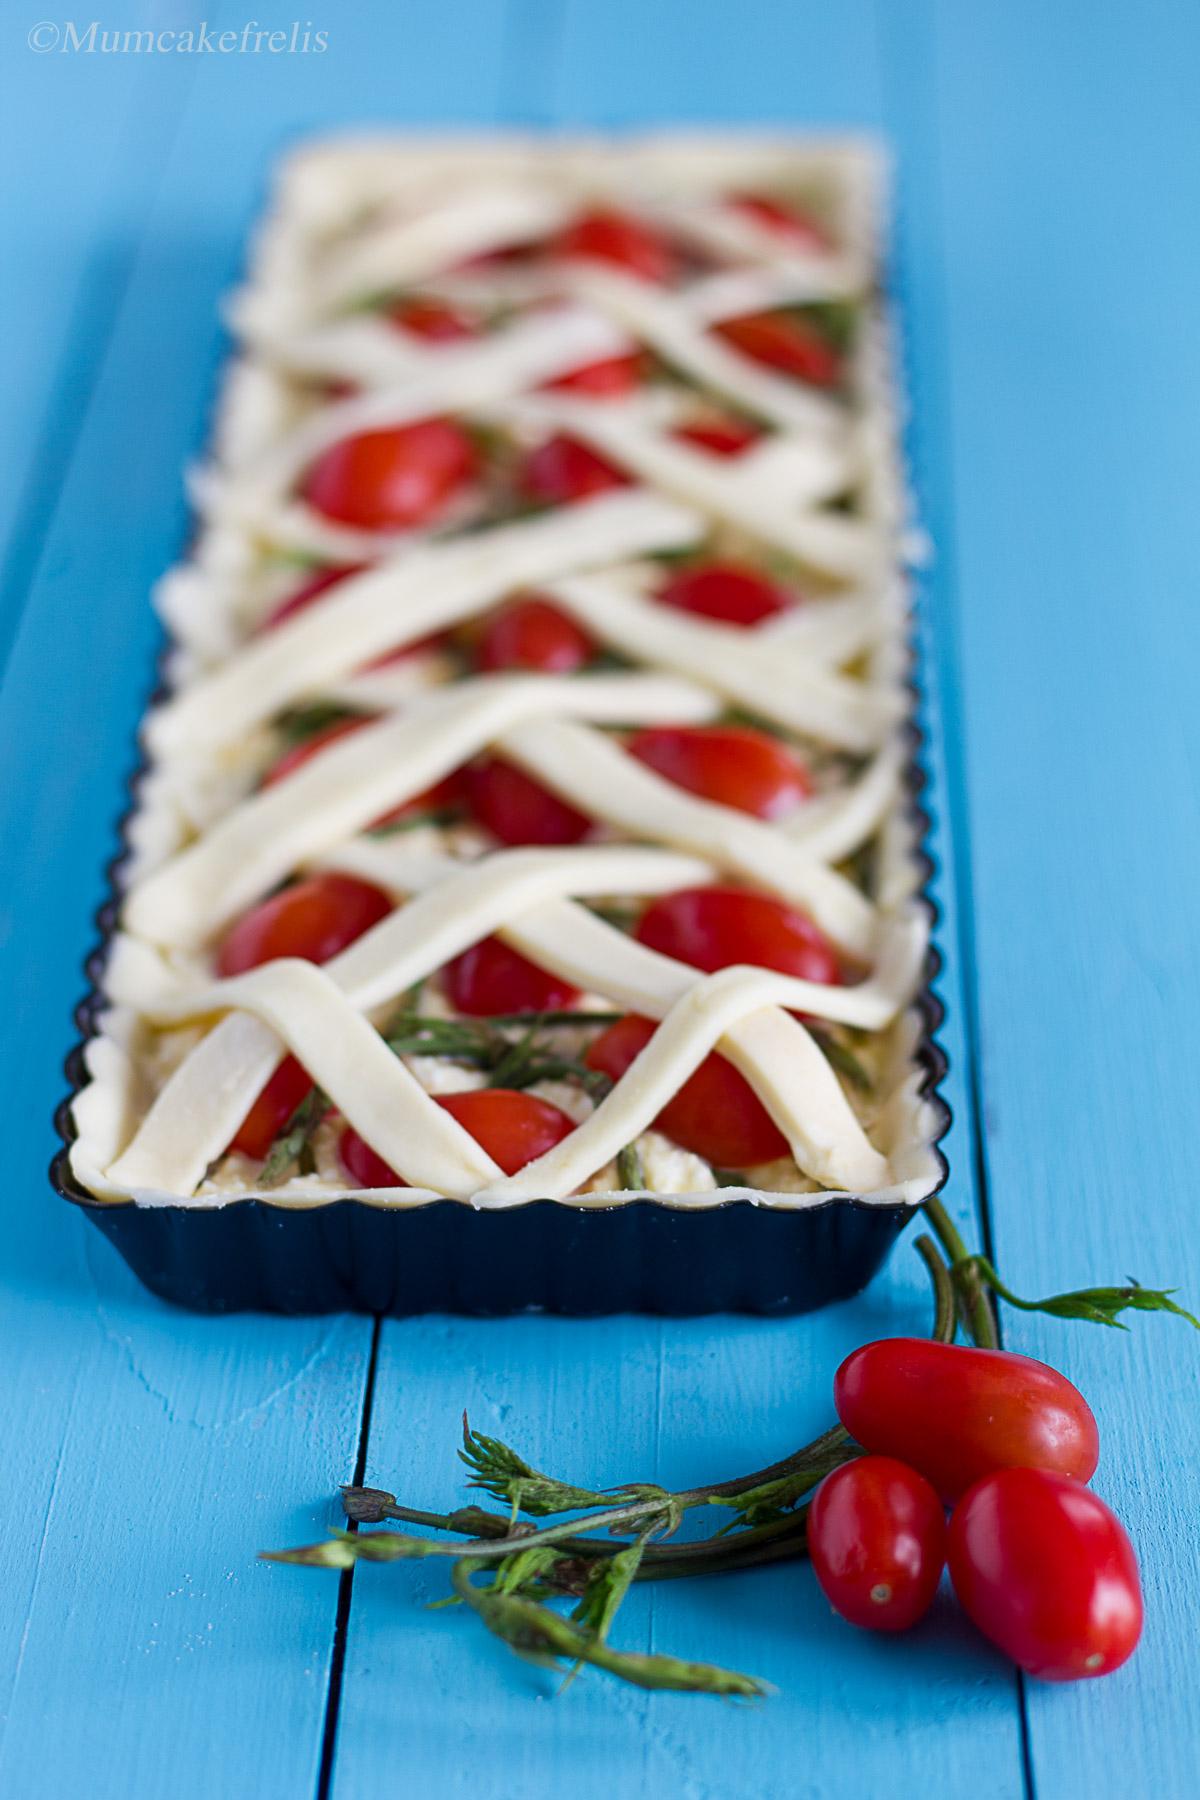 Torte salate mum cake frelis - Torte salate decorate ...